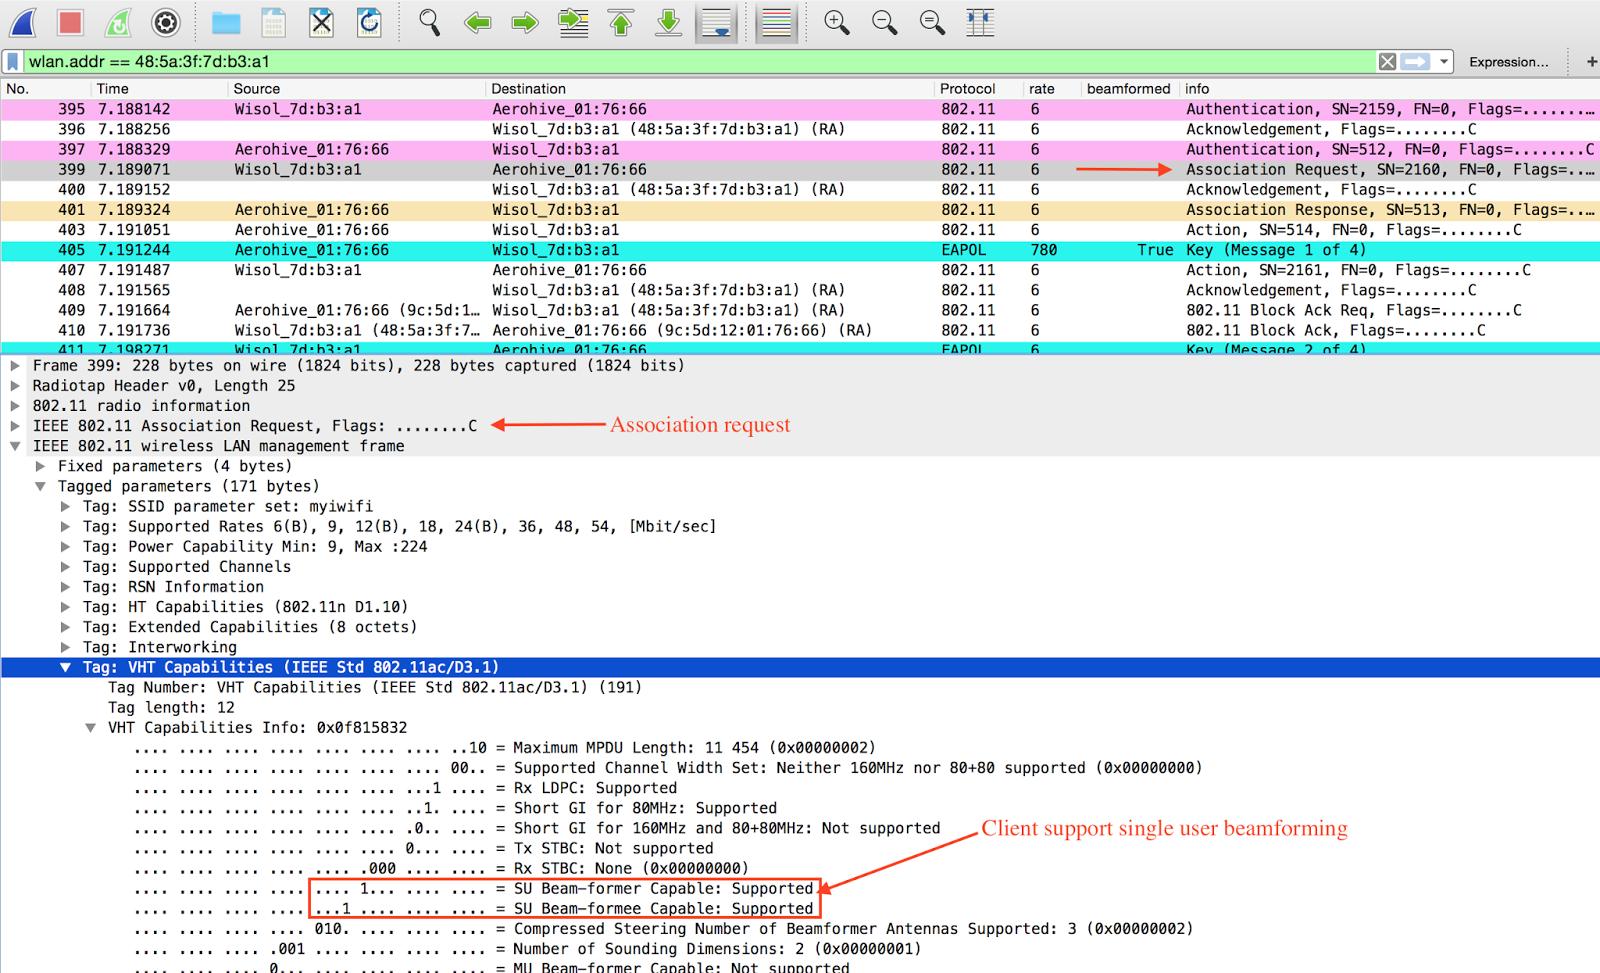 Ruwan's techno Blog: Is my 802 11ac wifi AP beamforming ?